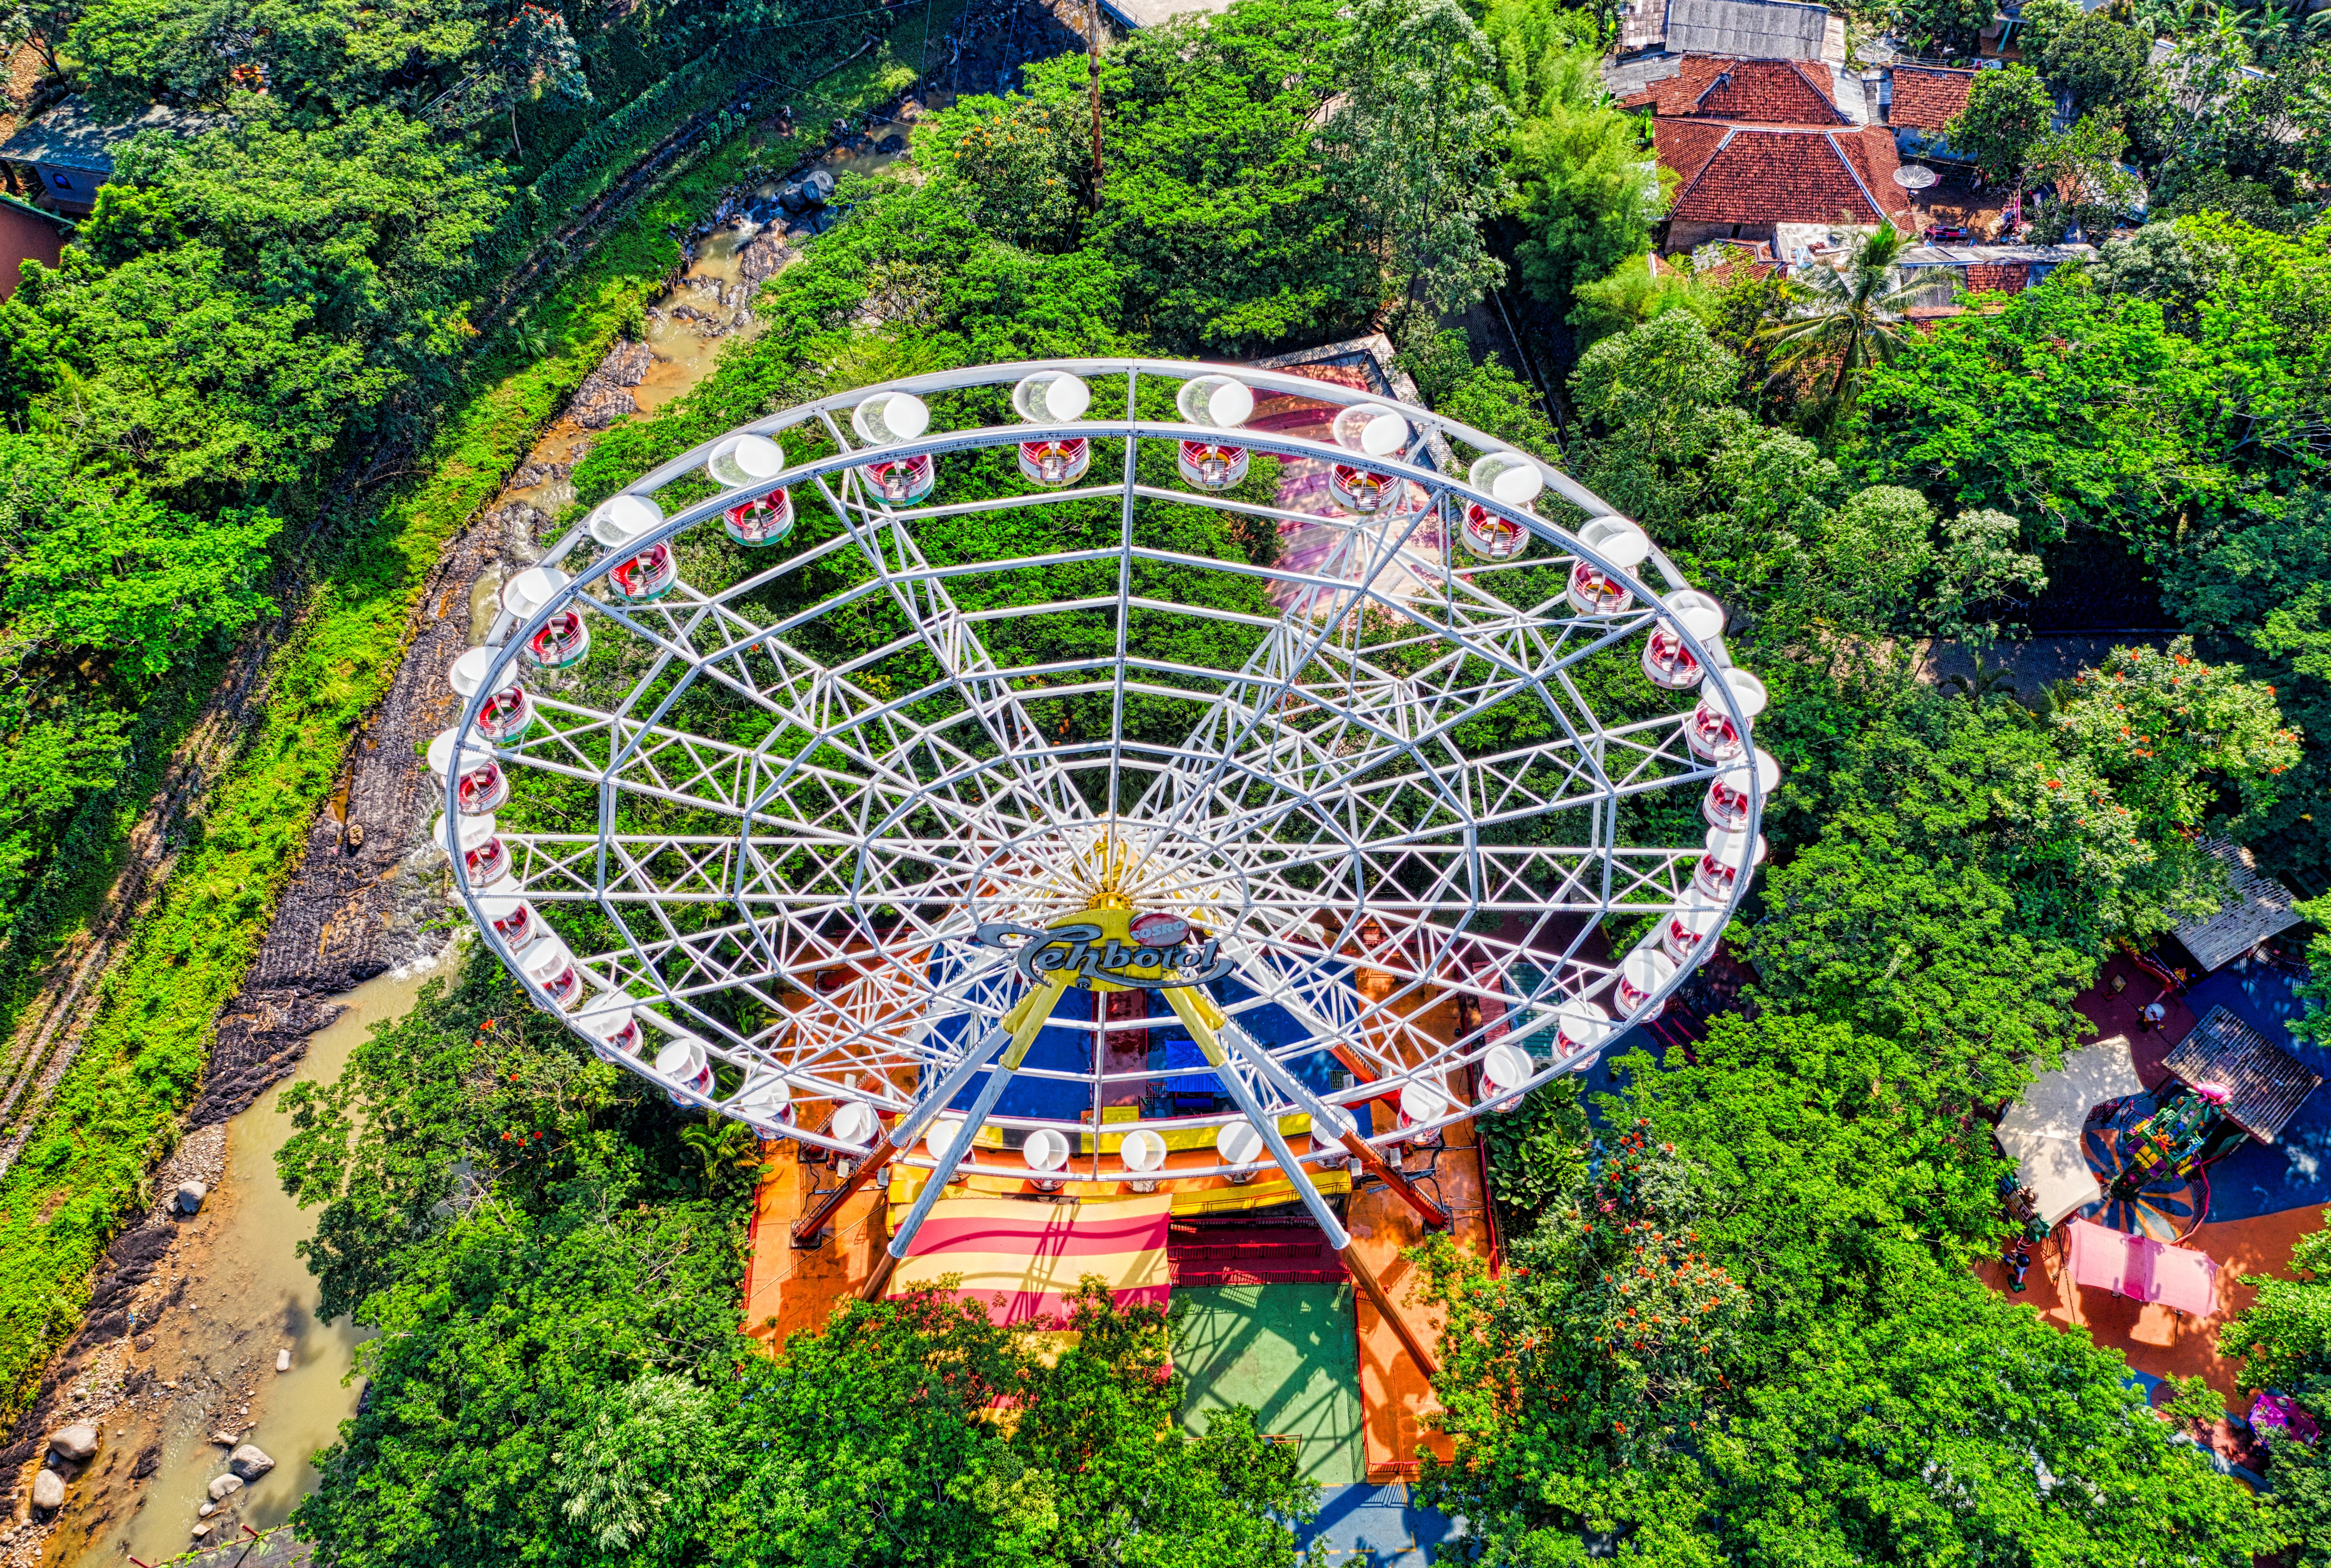 Aerial Photography of White Ferris Wheel